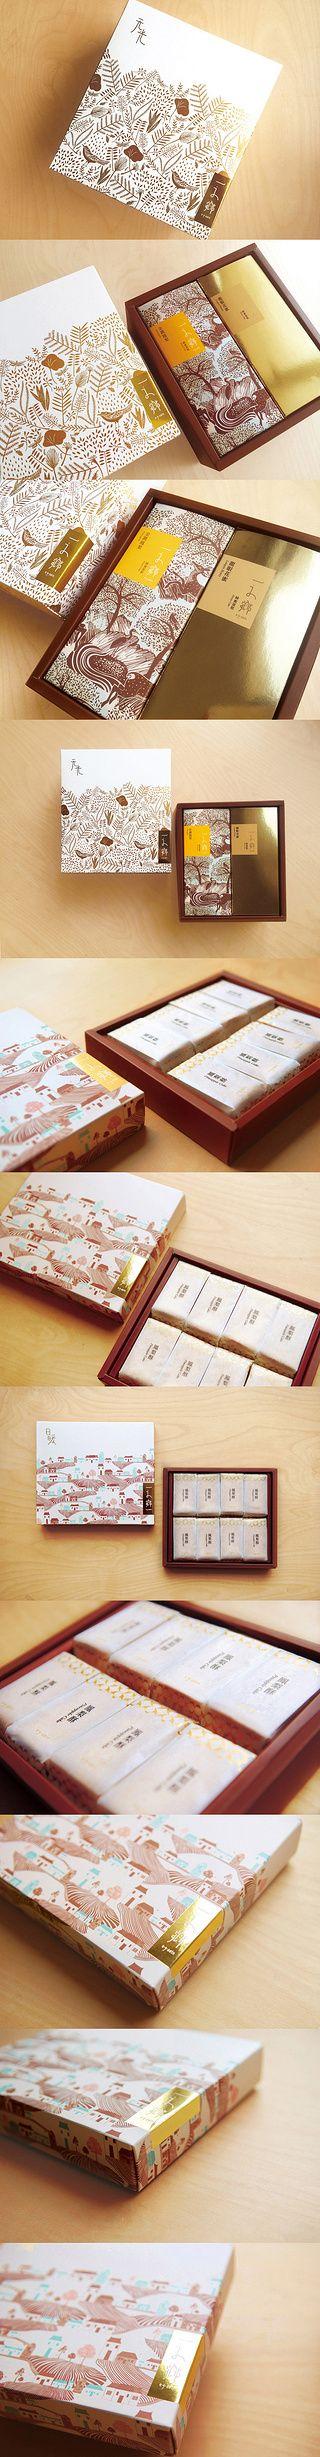 #Madhukura高级蜂蜜包装设计#这...@DearV_Dolin采集到设计-包装(347图)_花瓣平面设计